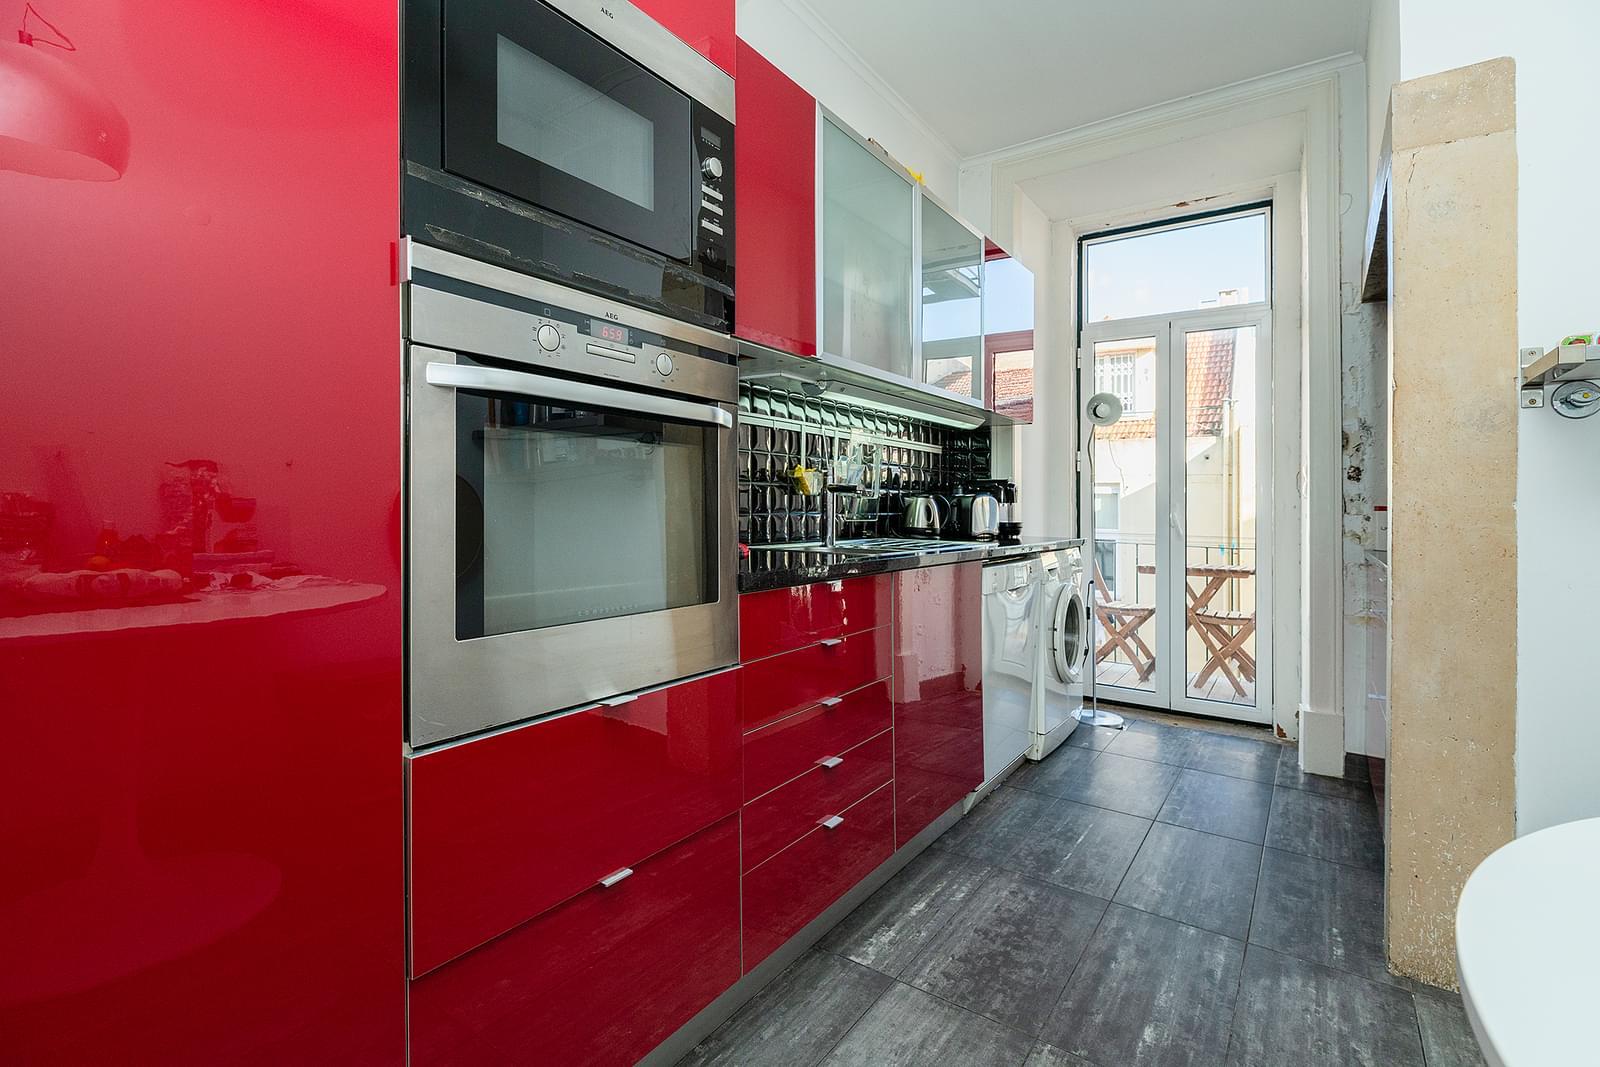 pf18211-apartamento-t2-1-lisboa-626eaeda-e702-4d30-a709-331d32c023da